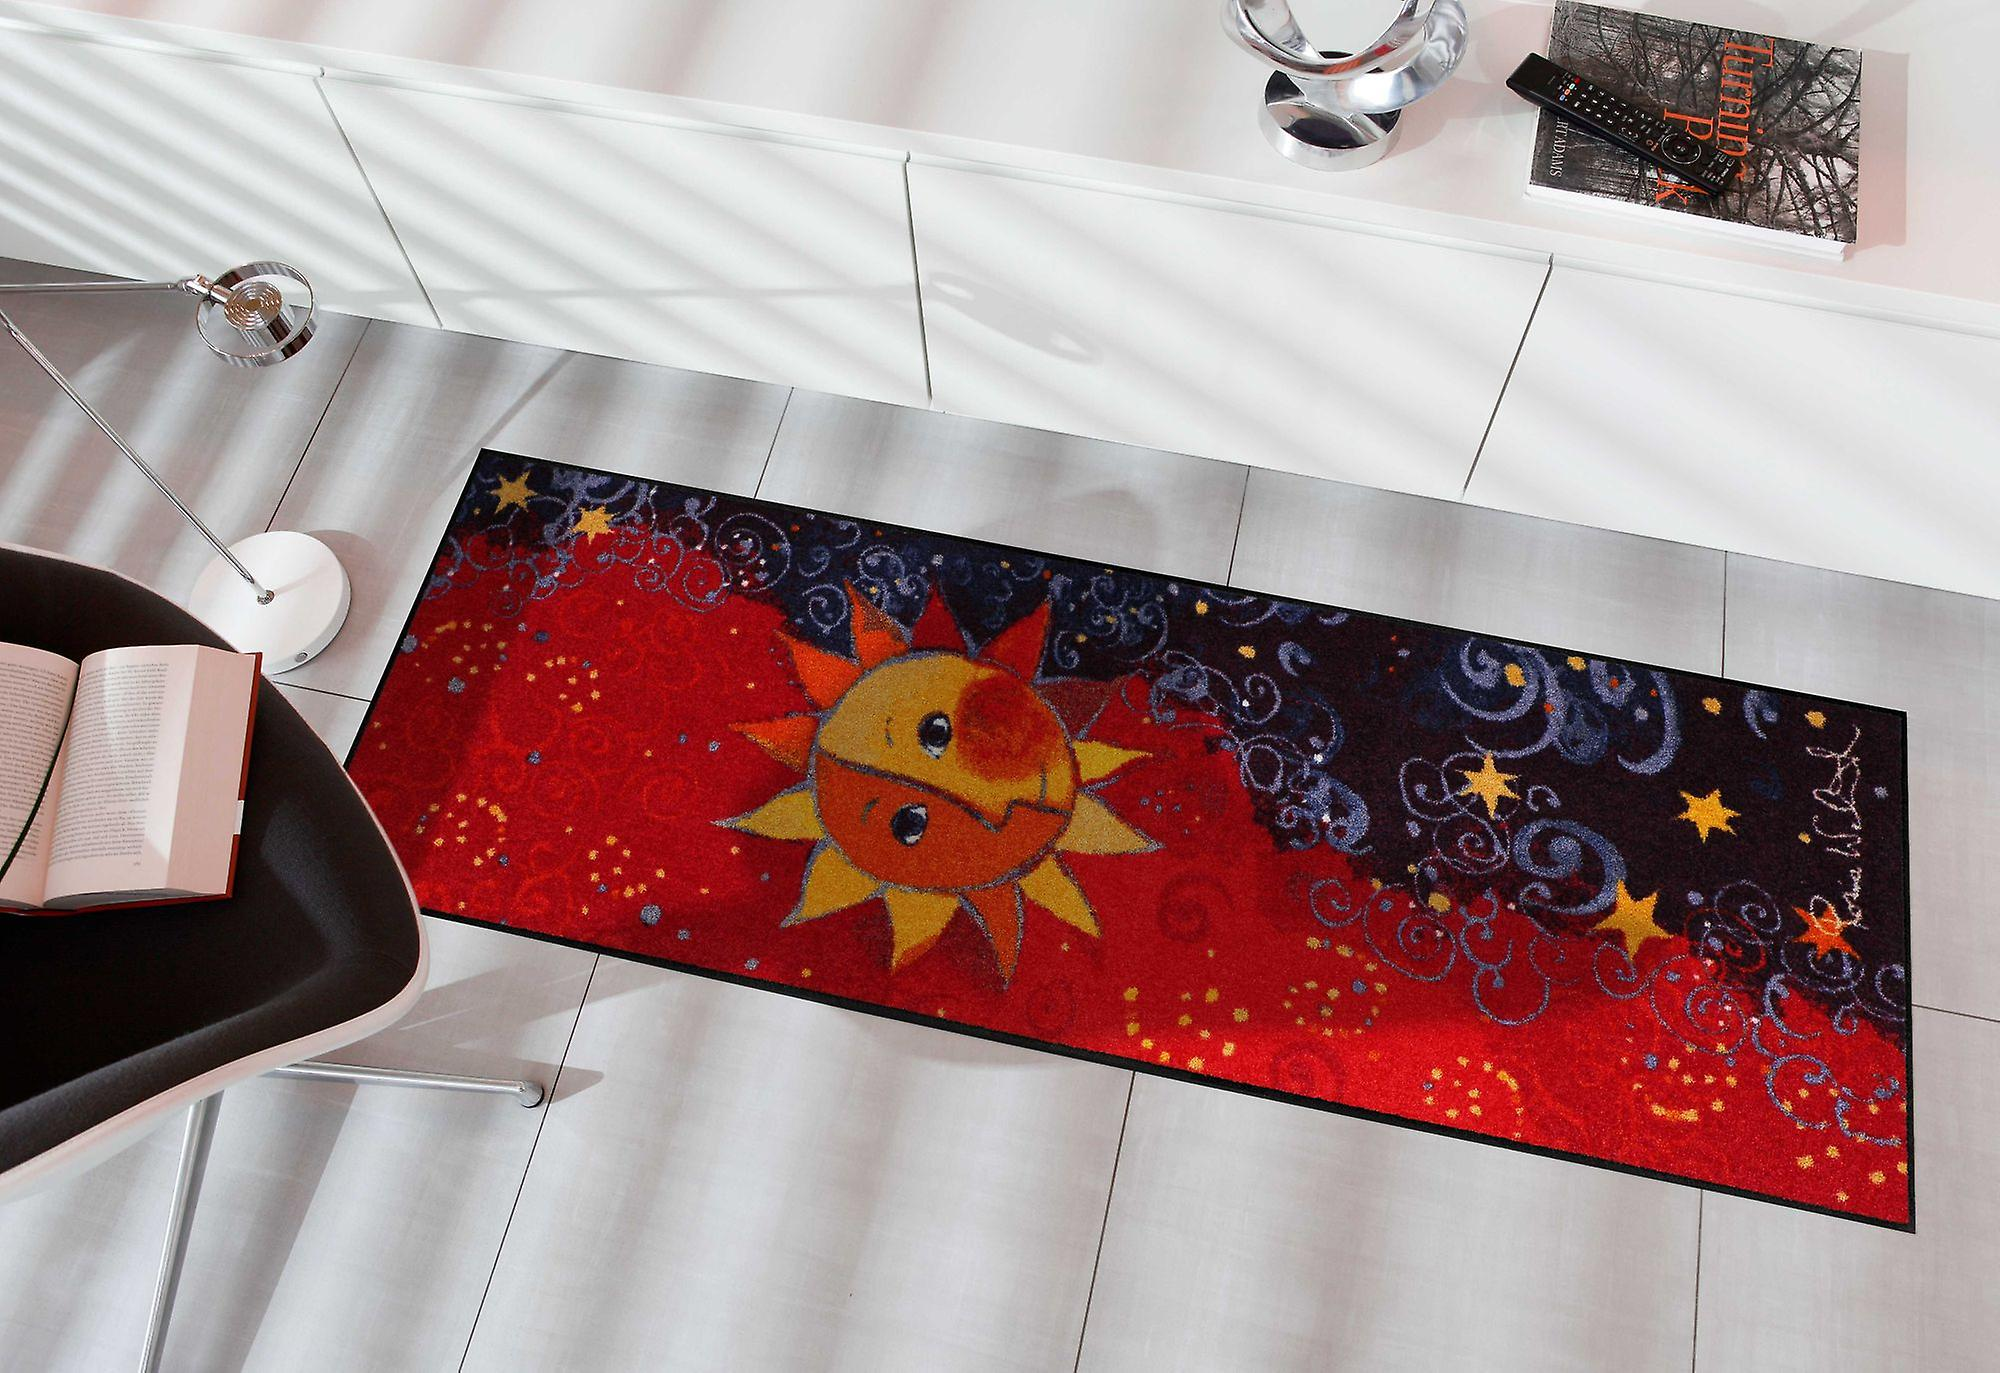 Rosina Wachtmeister deurmat enige remake 60 x 180 cm wasbaar vuil mat